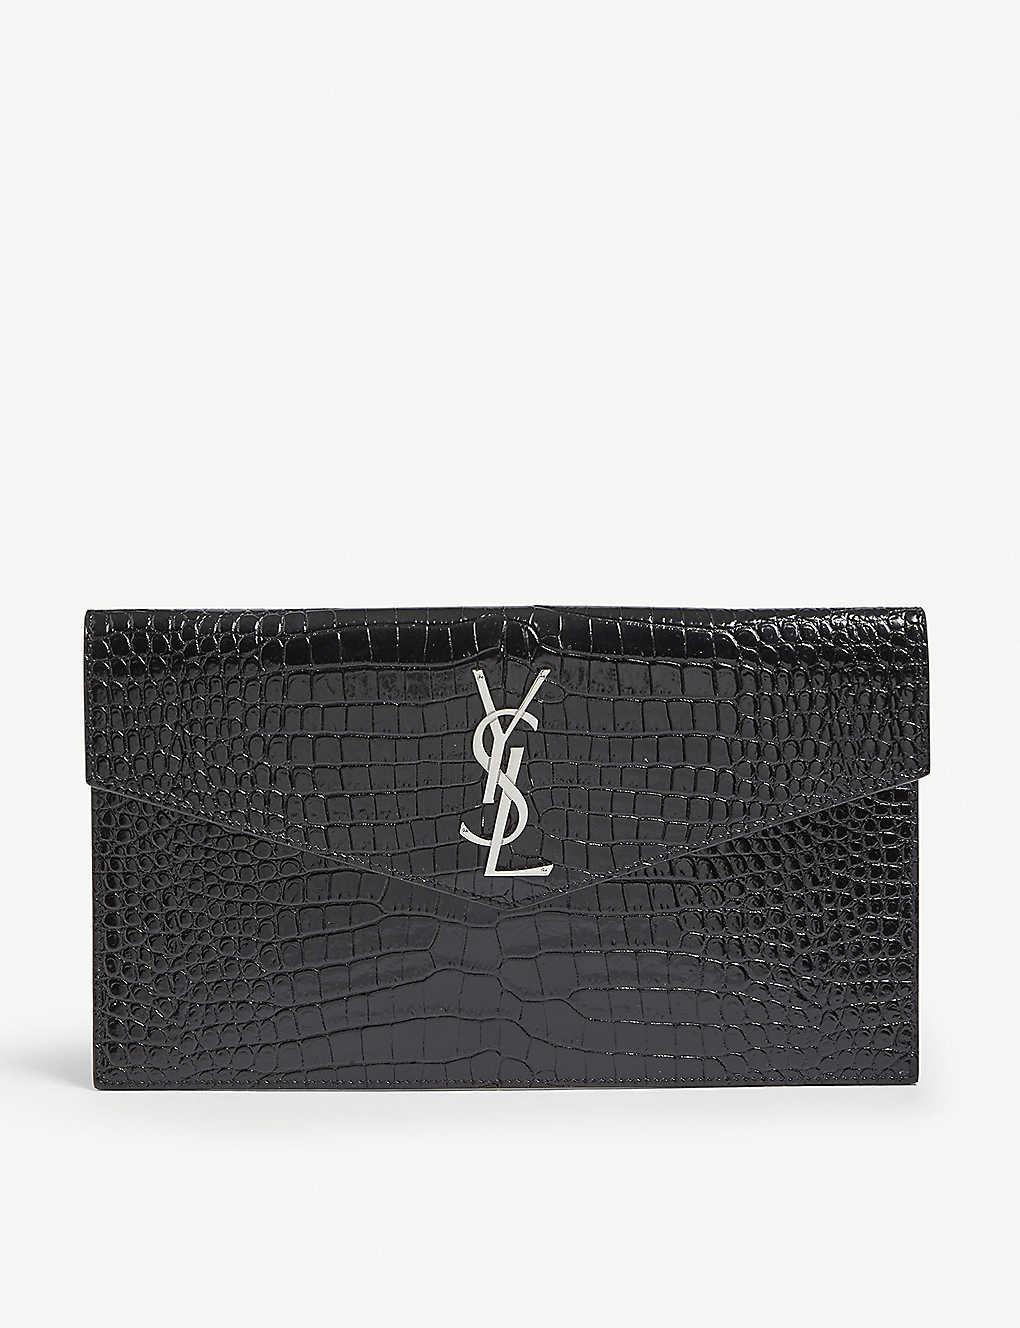 4f8efb2a44124 SAINT LAURENT - Monogram Uptown croc-embossed leather pouch ...